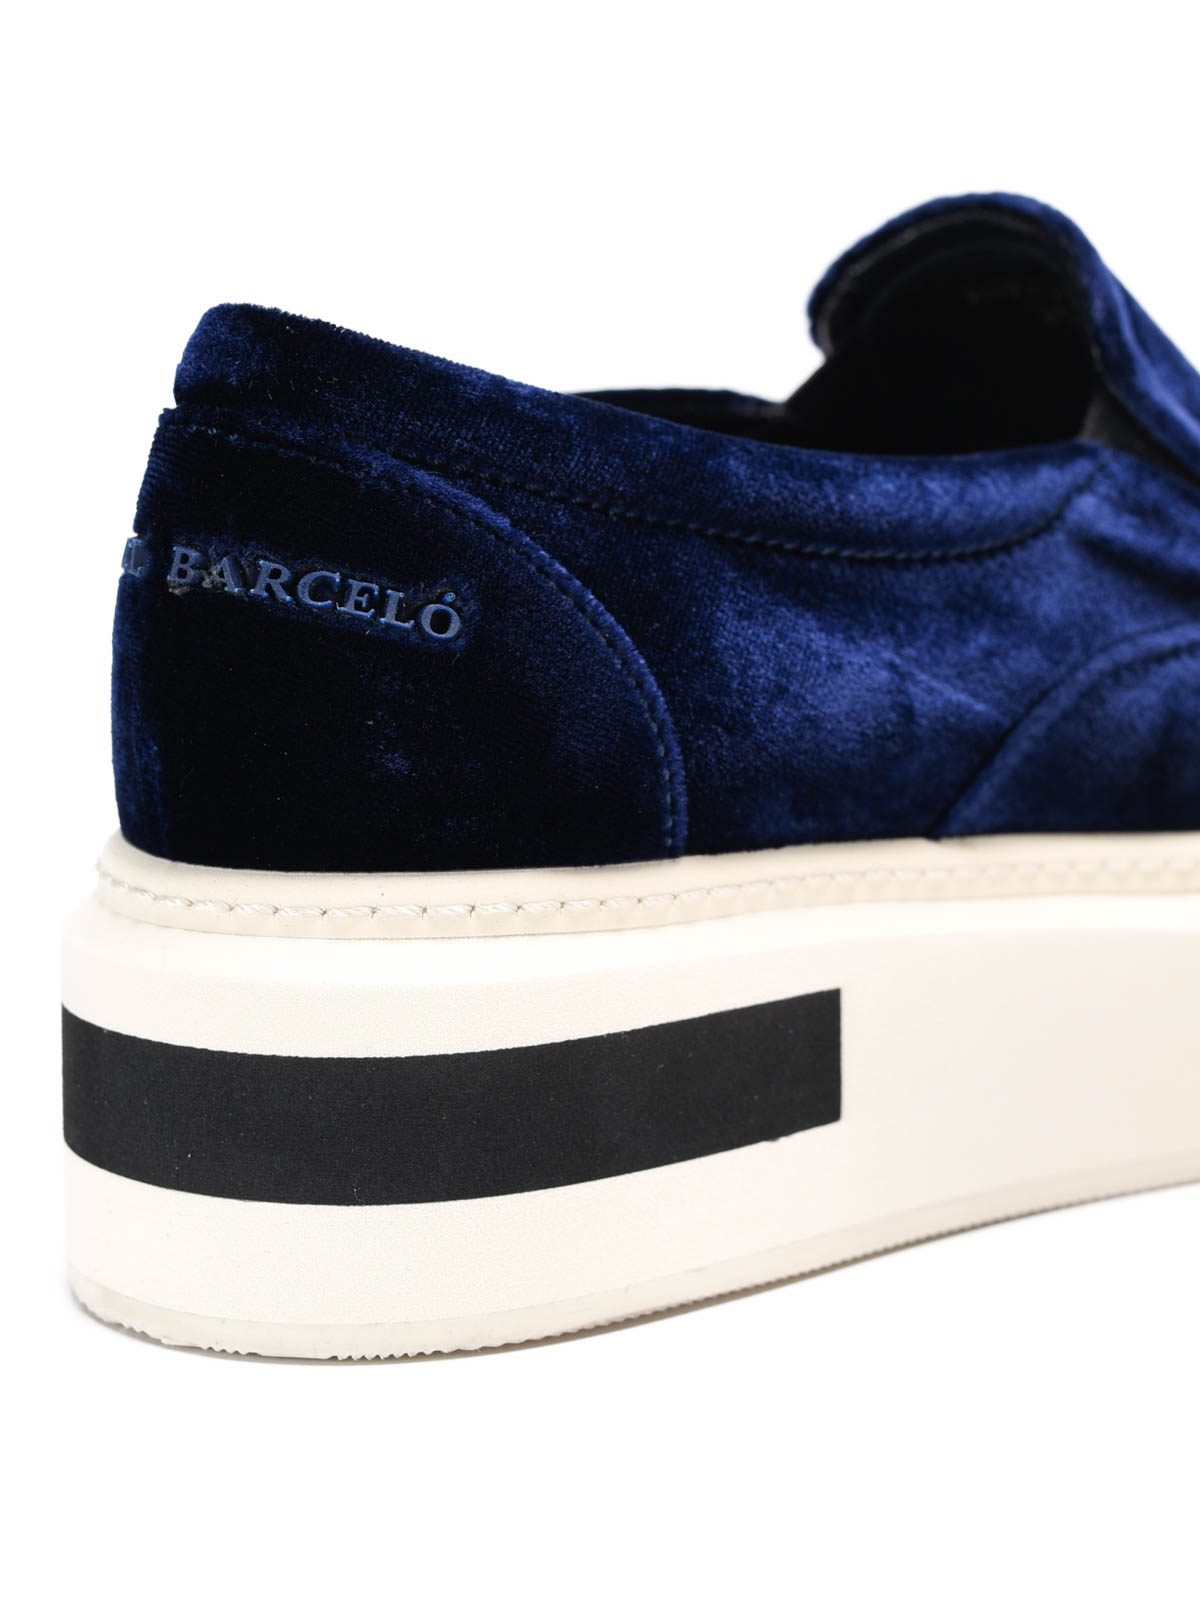 new product ff3ca 7a536 Manuel Barcelo' - Oxford velvet slip-ons - trainers - SSLB VEBL